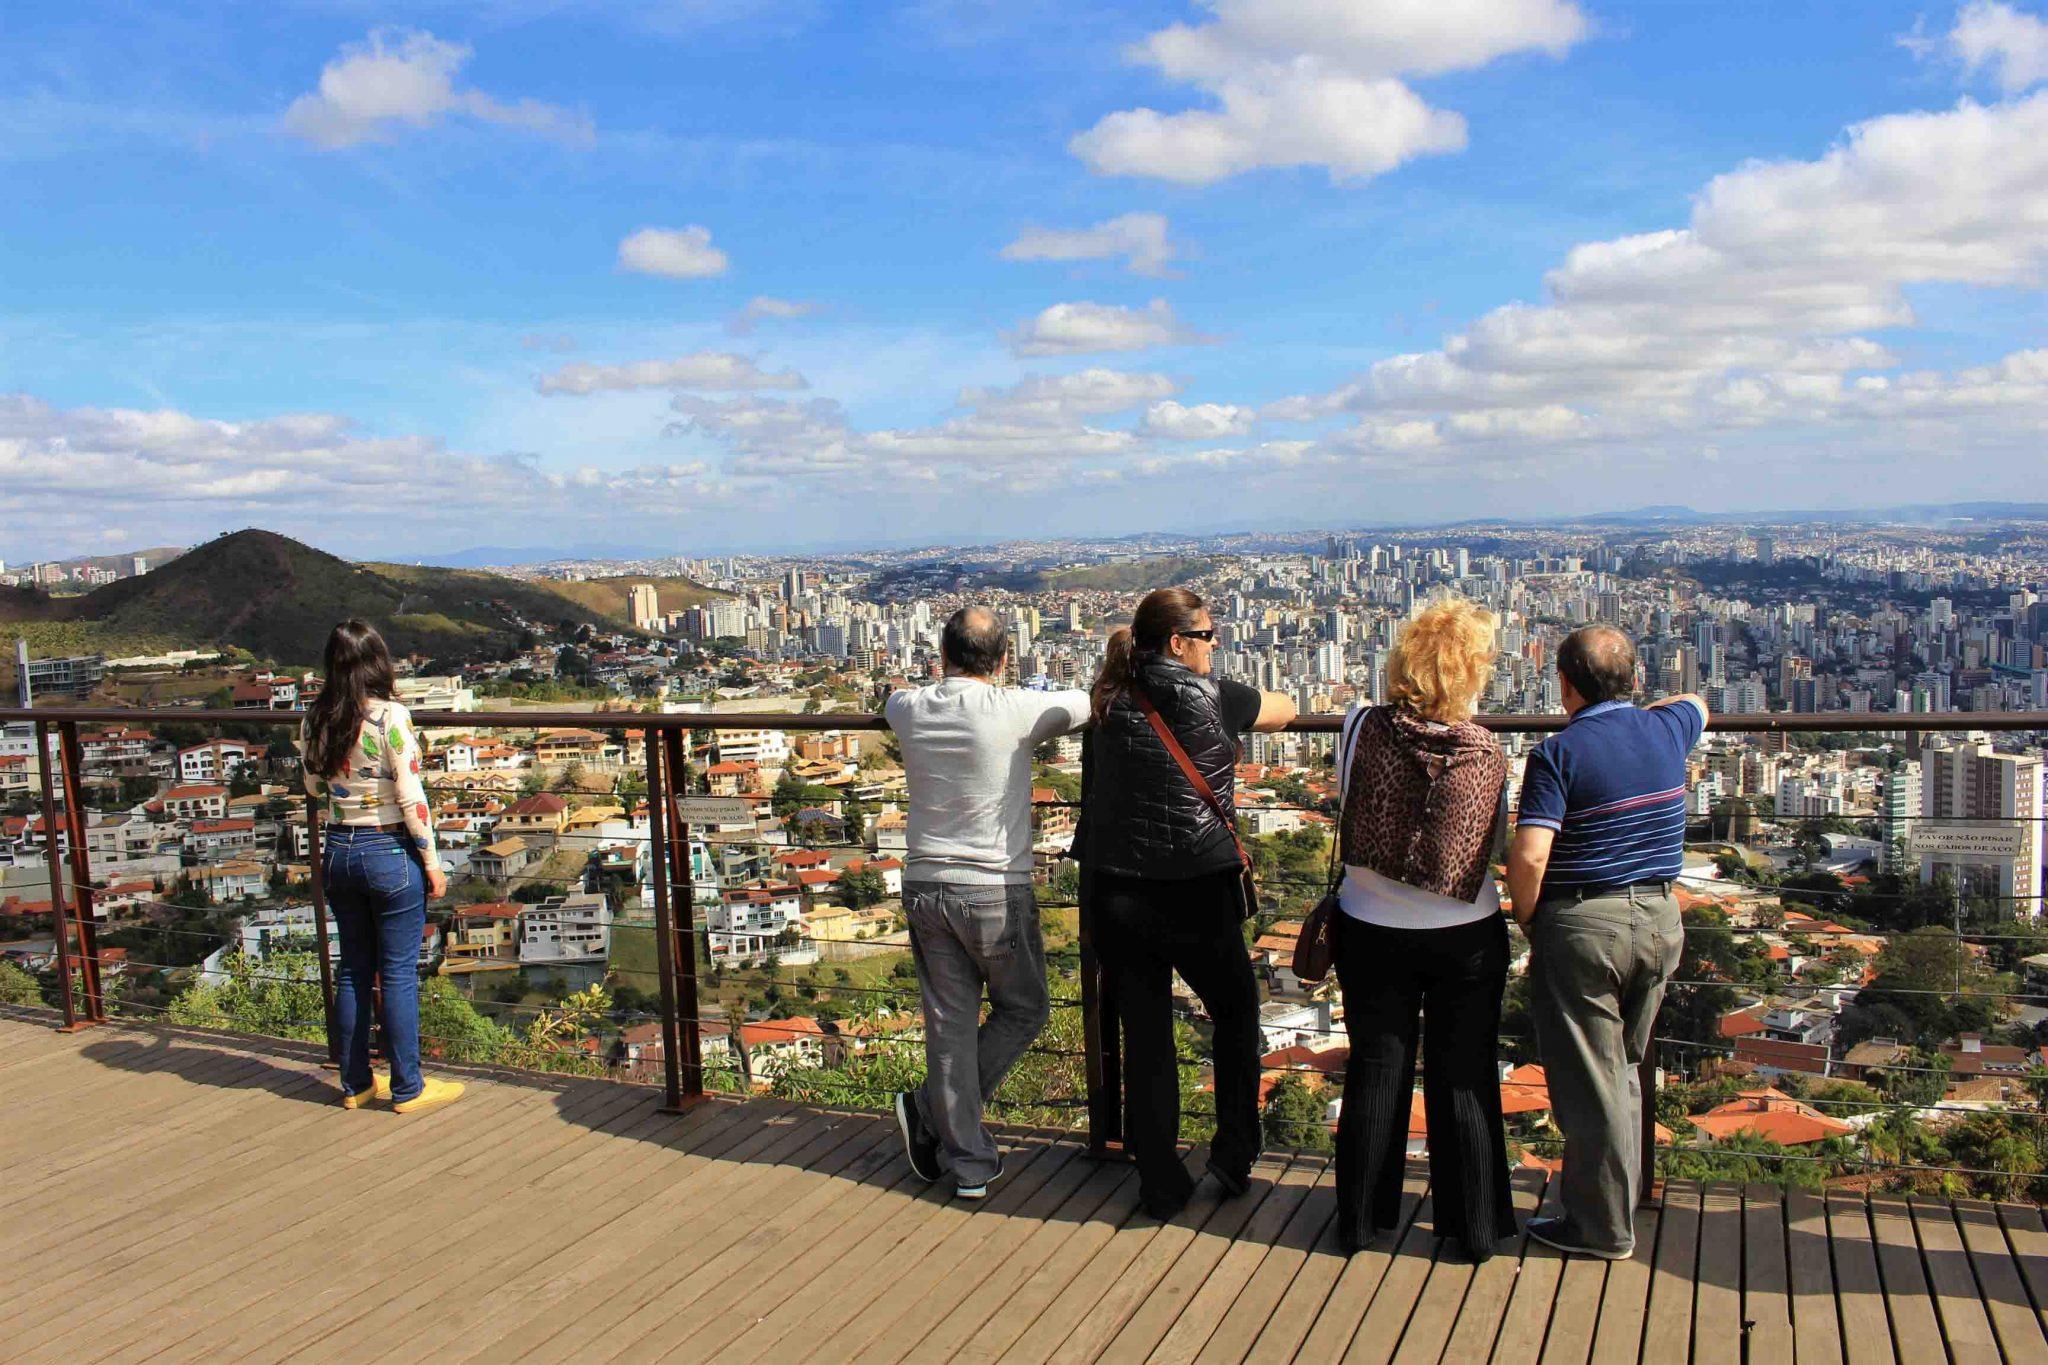 Mirante do Mangabeiras | Foto: Marden Couto/Turismo de Minas